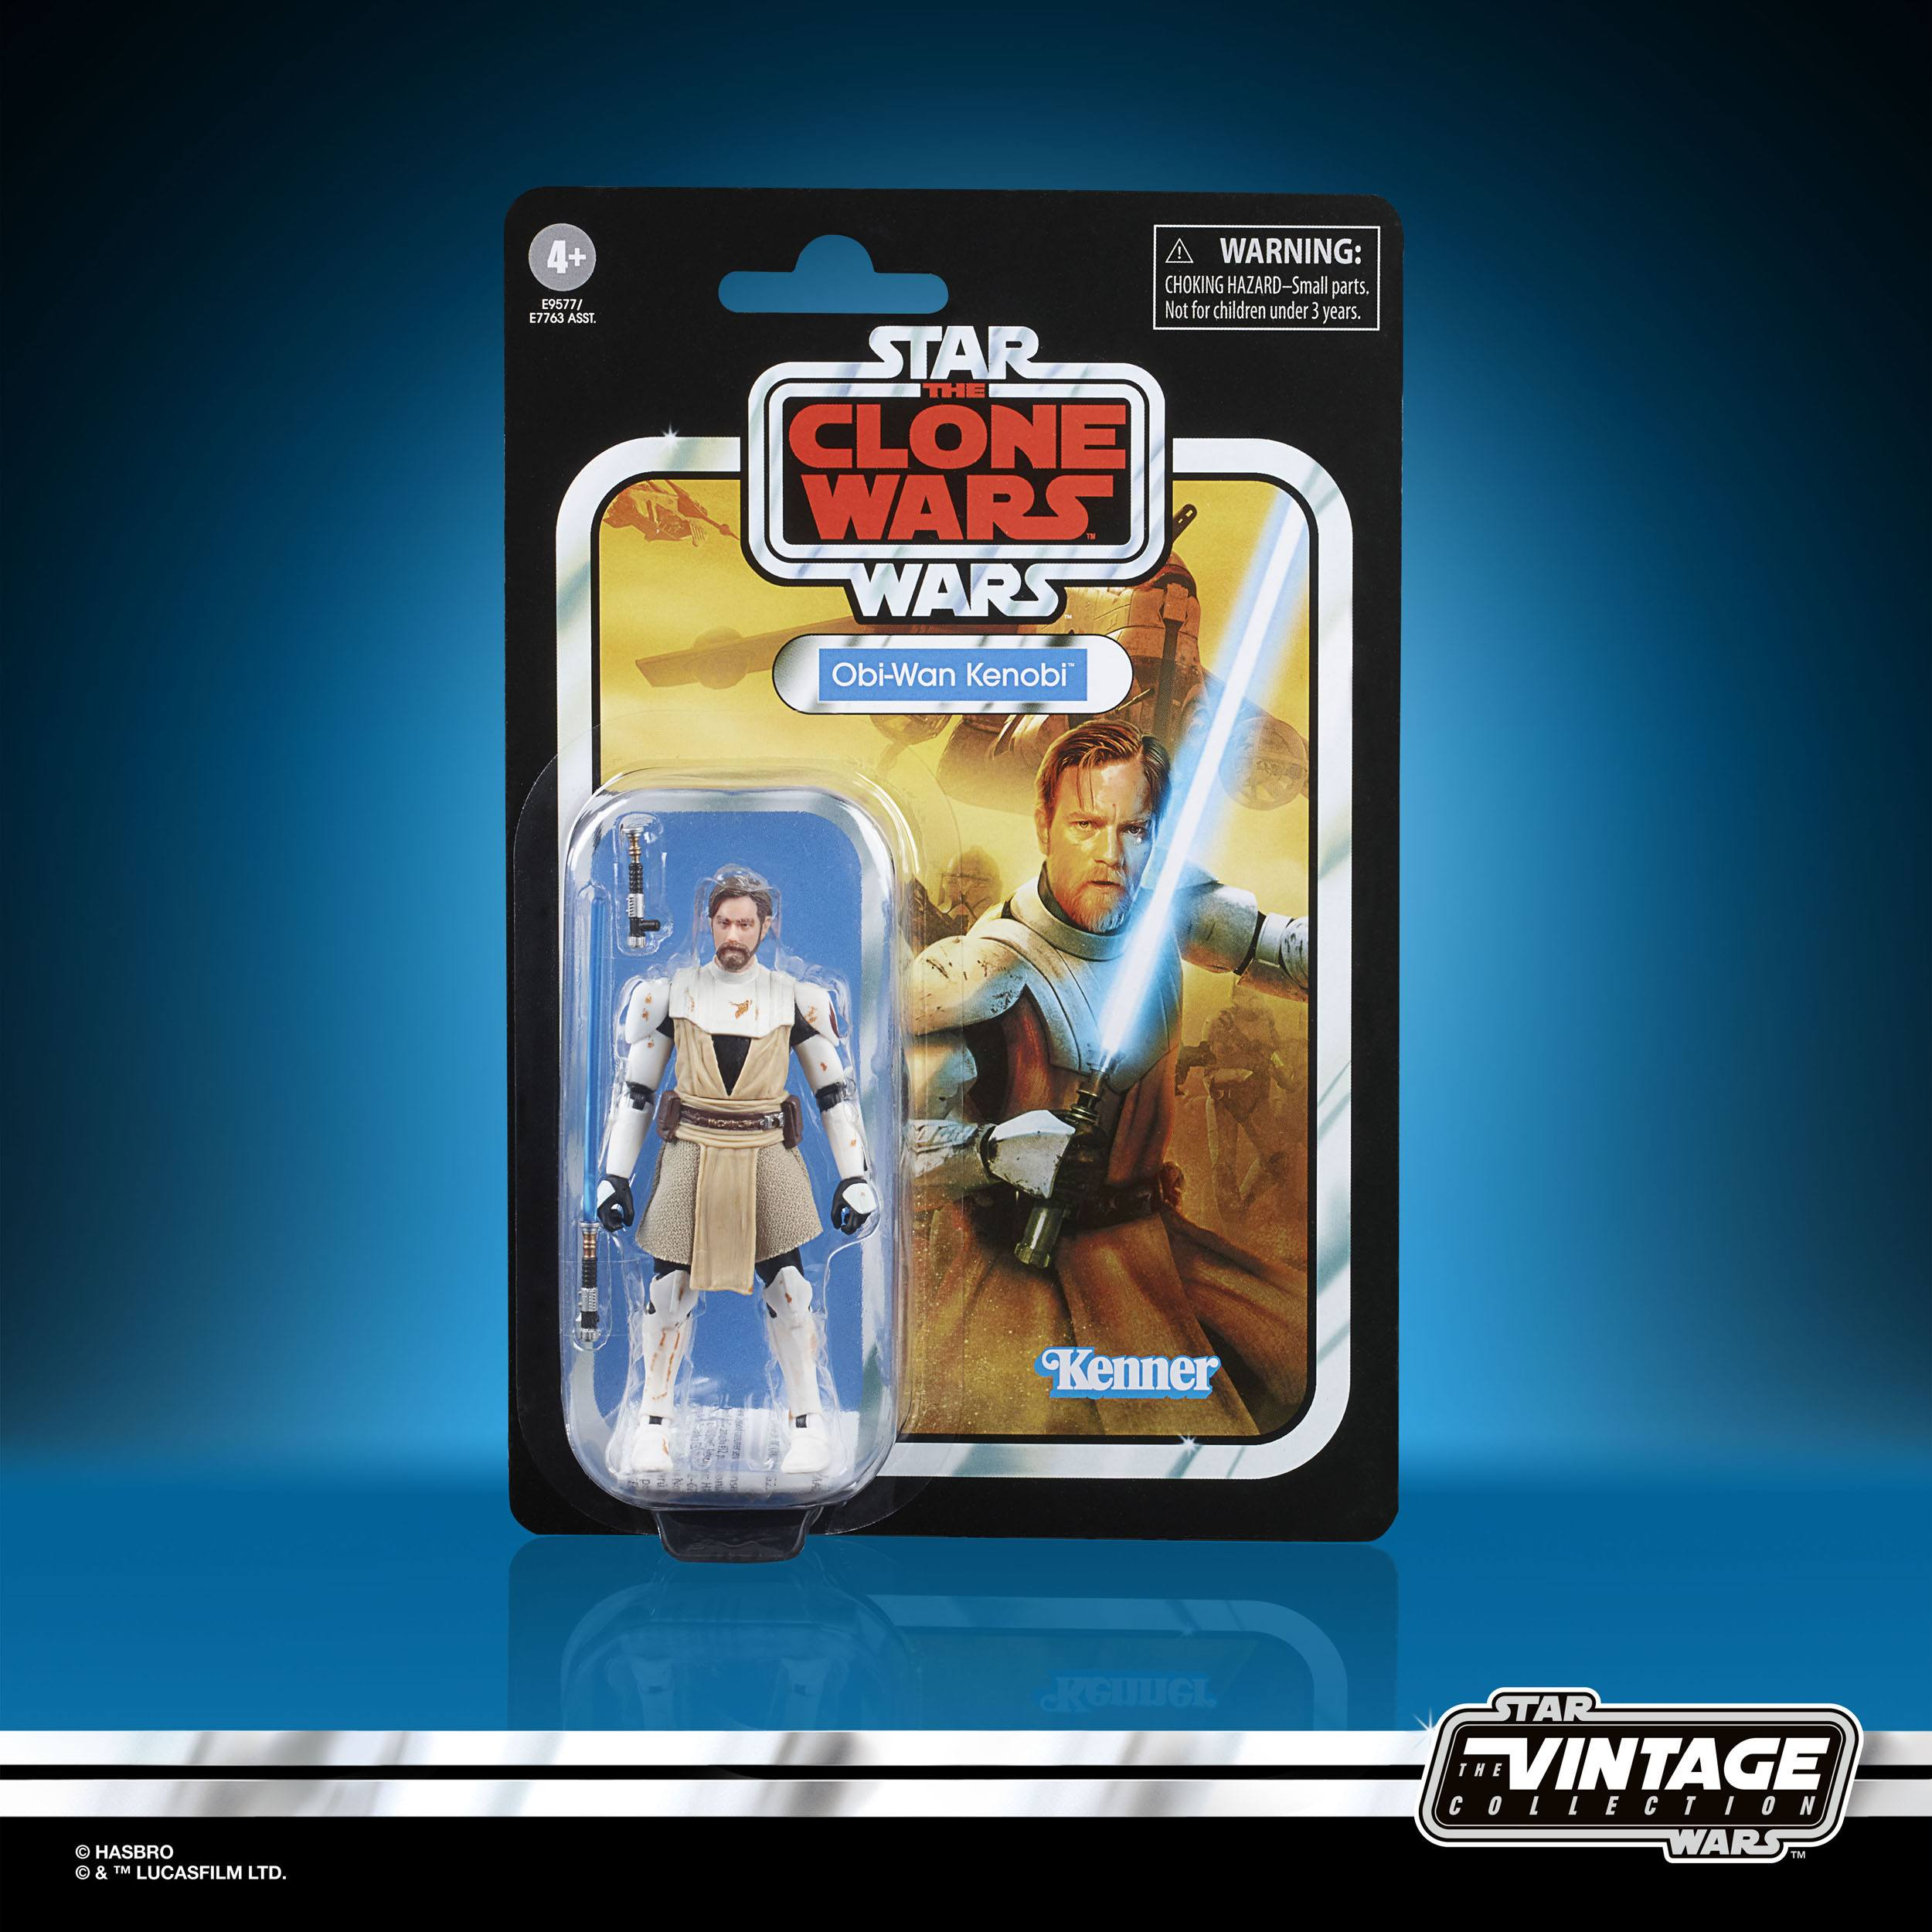 Star Wars VIN S3 VINTAGES Figures Assortment (4) - Wave 3 E77635L02 5010993736904